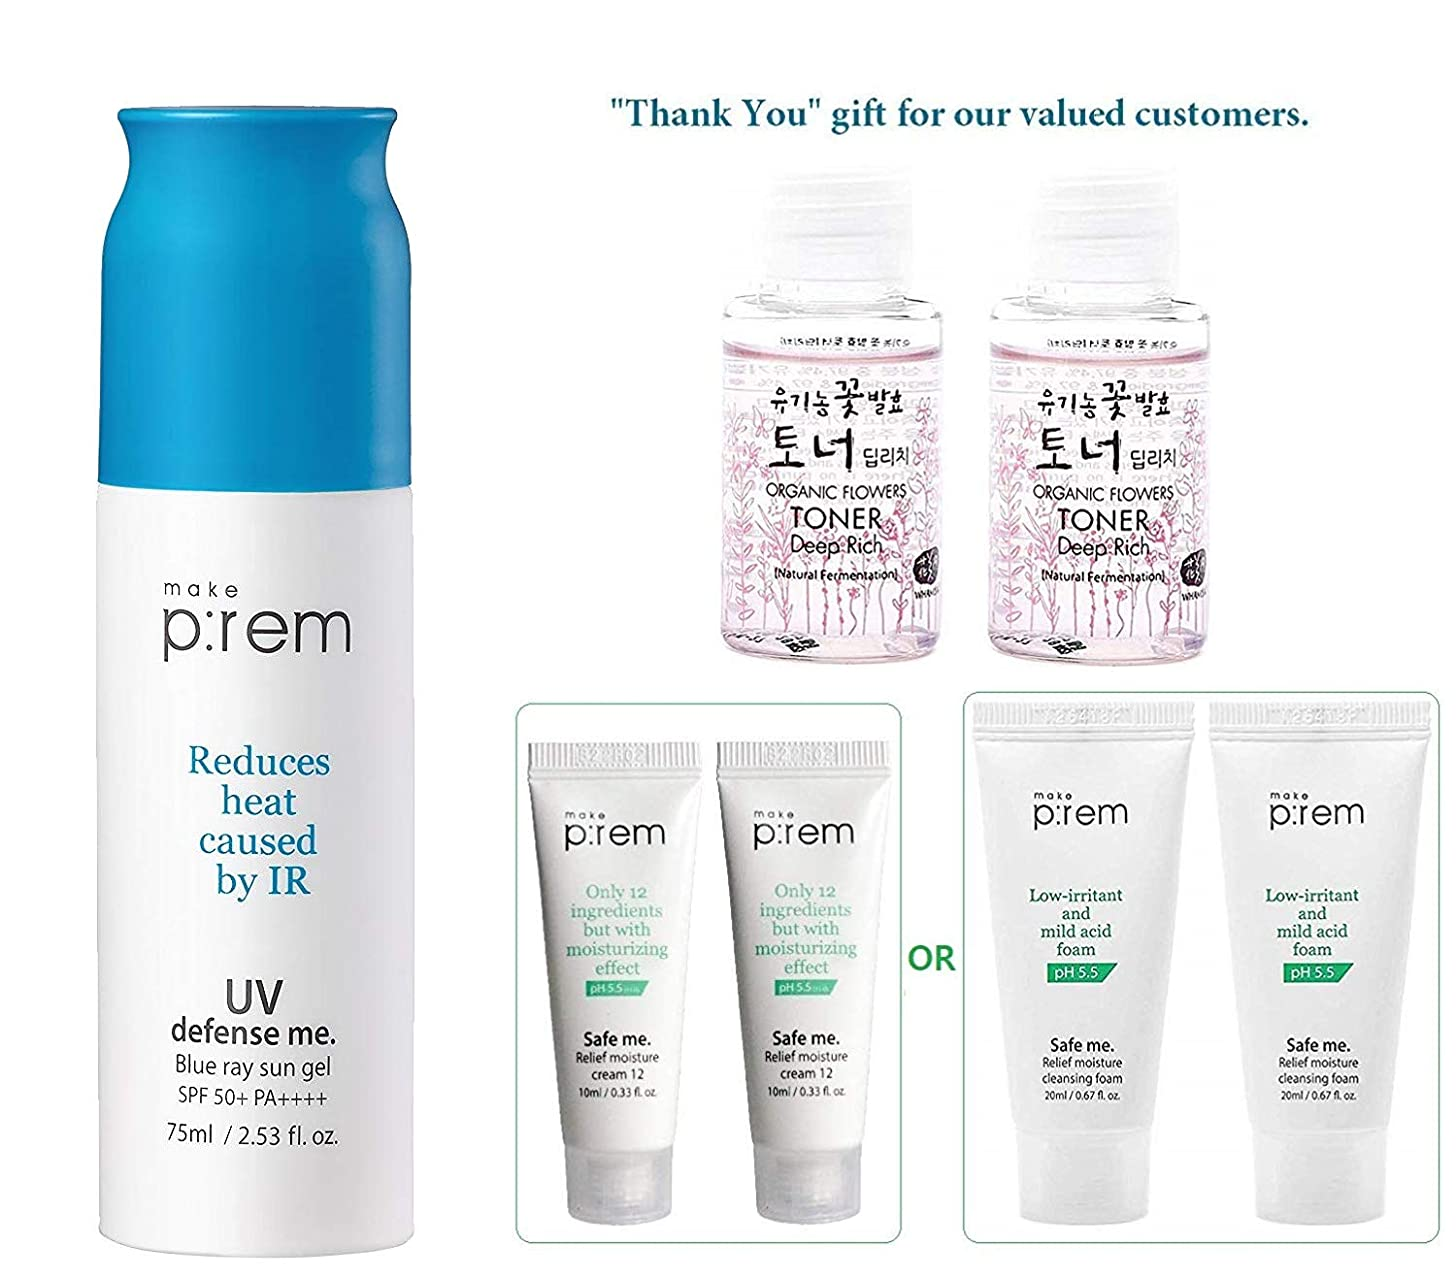 MAKEP:REM UV Defense Me Blue Ray Sun Gel 75ml / 2.53 fl. oz. with Relif Moisture Cream 20ml Whamisa Organic Essence Toner 40ml | SPF 50+ PA++++ by MAKEPREM MAKE P:REM